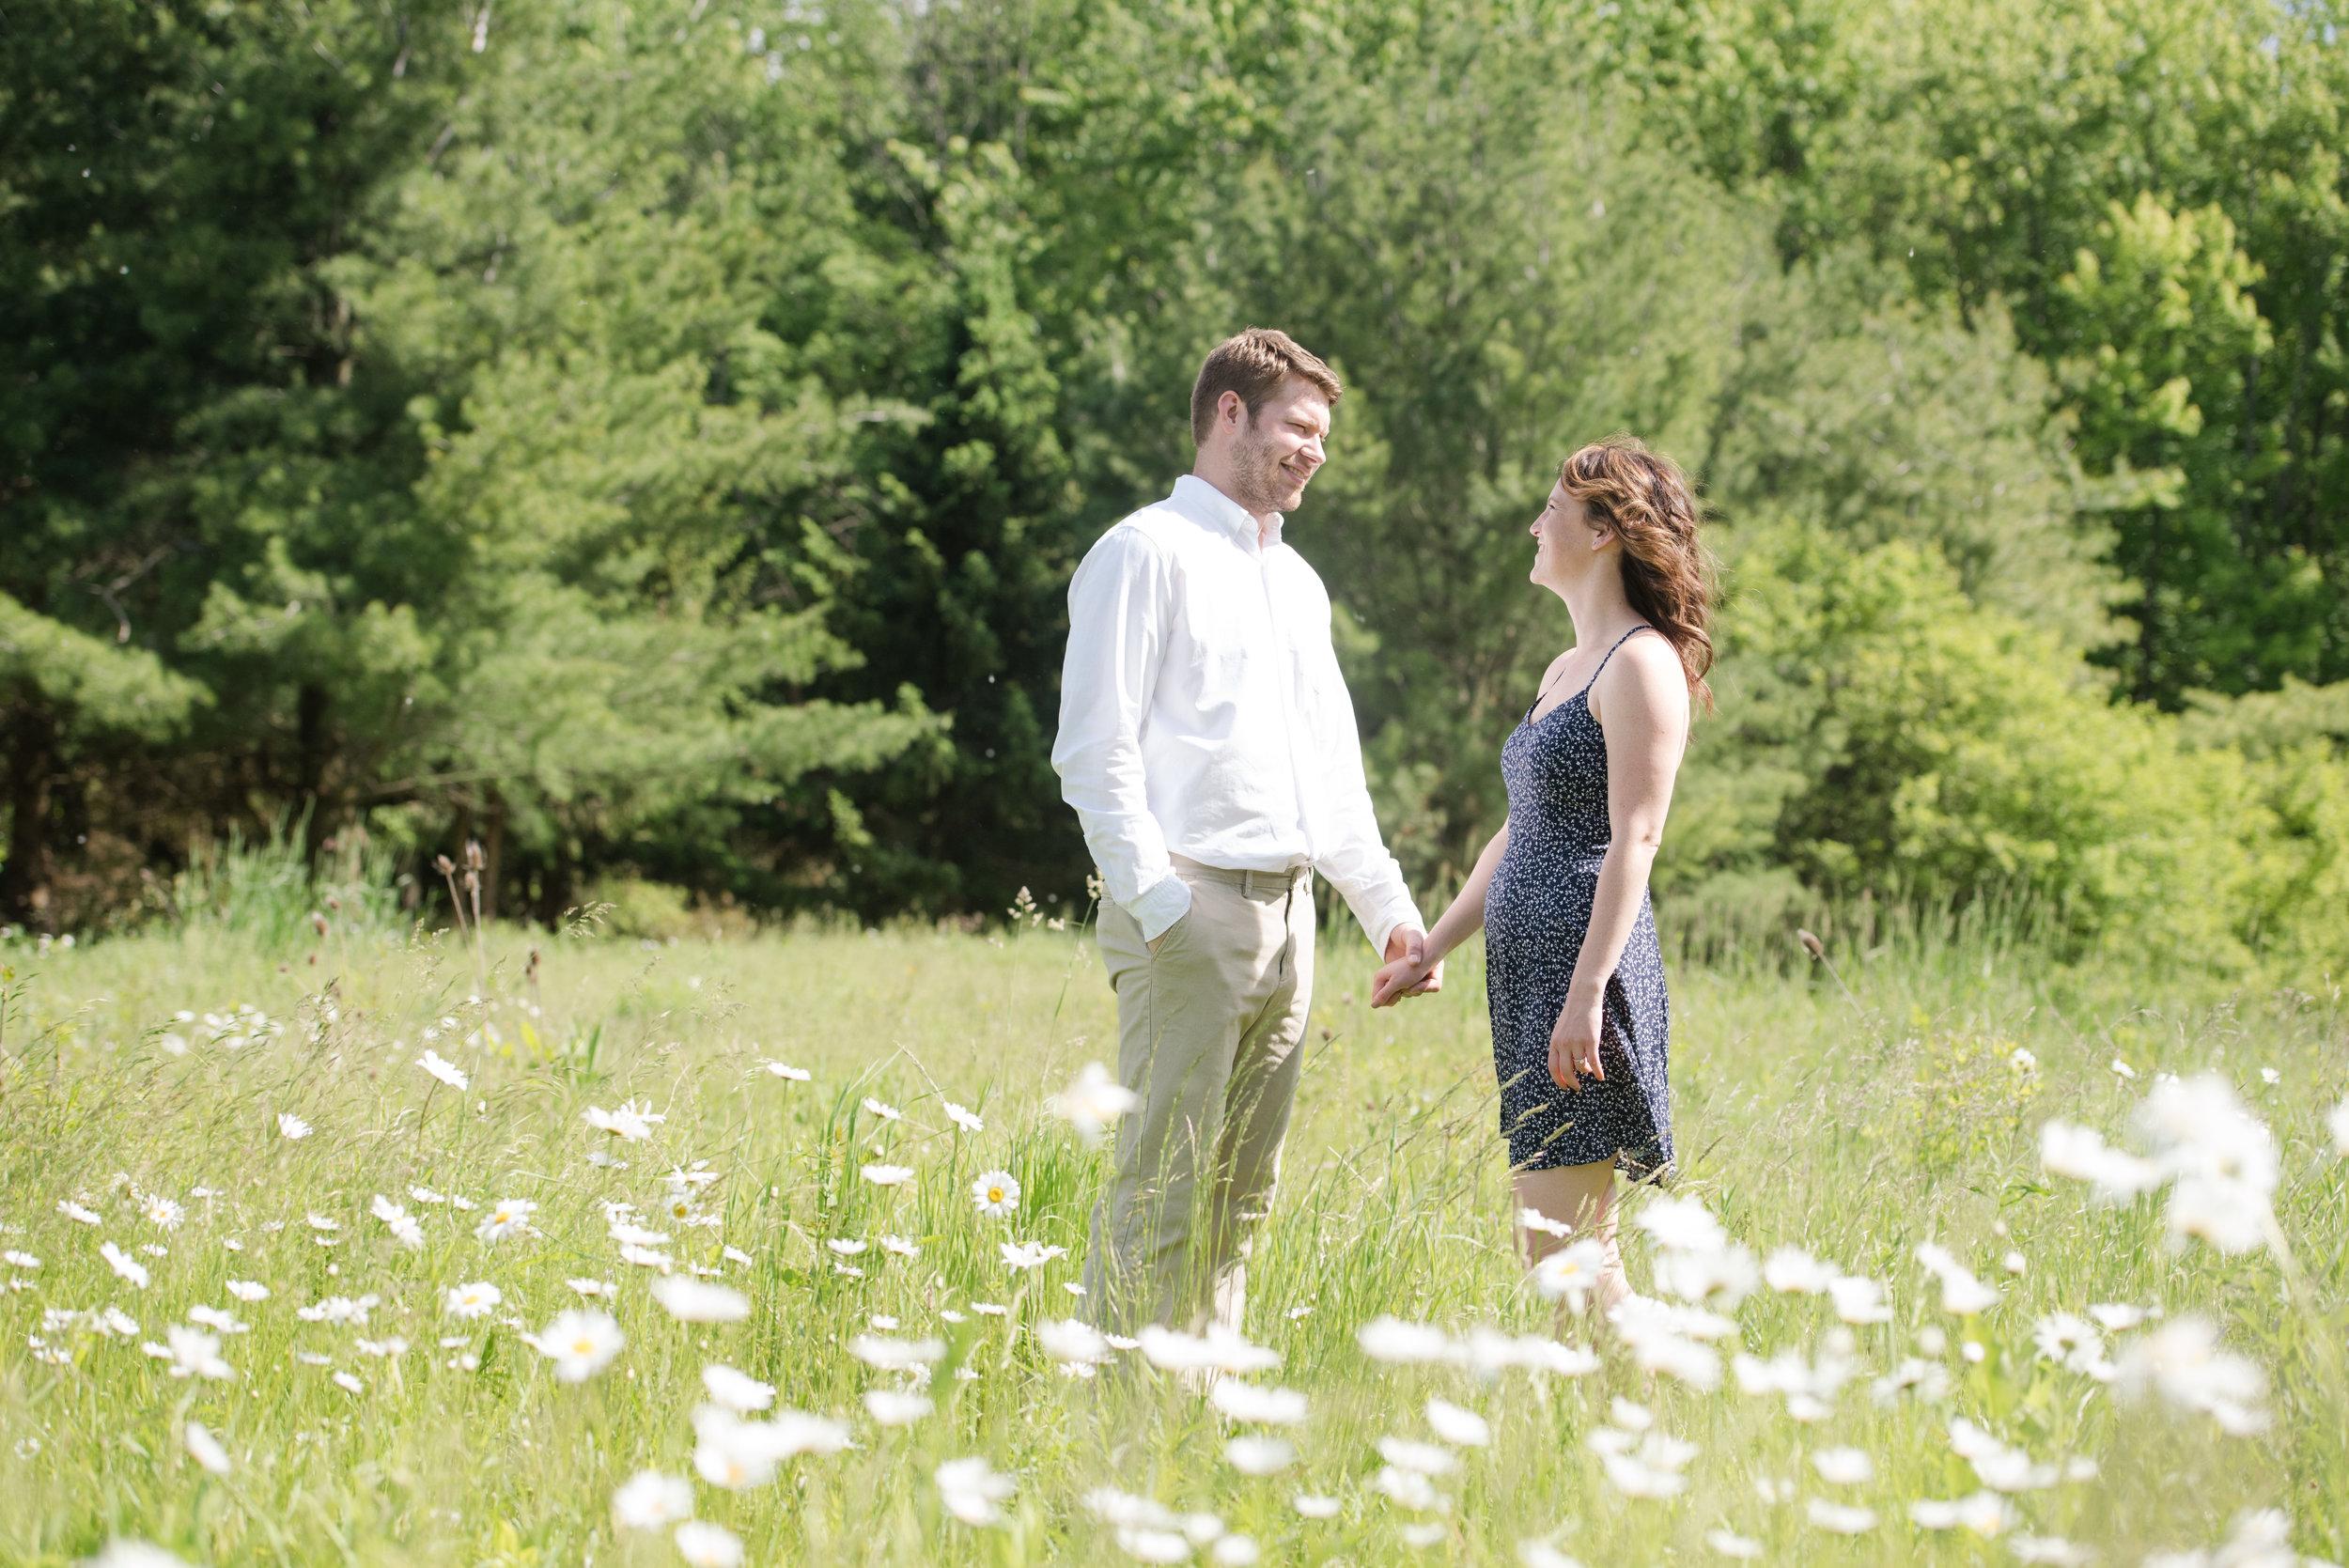 GALLERY-2019-6-9 Kaitlin, Justin & Liam Engagement 0563 72.jpg